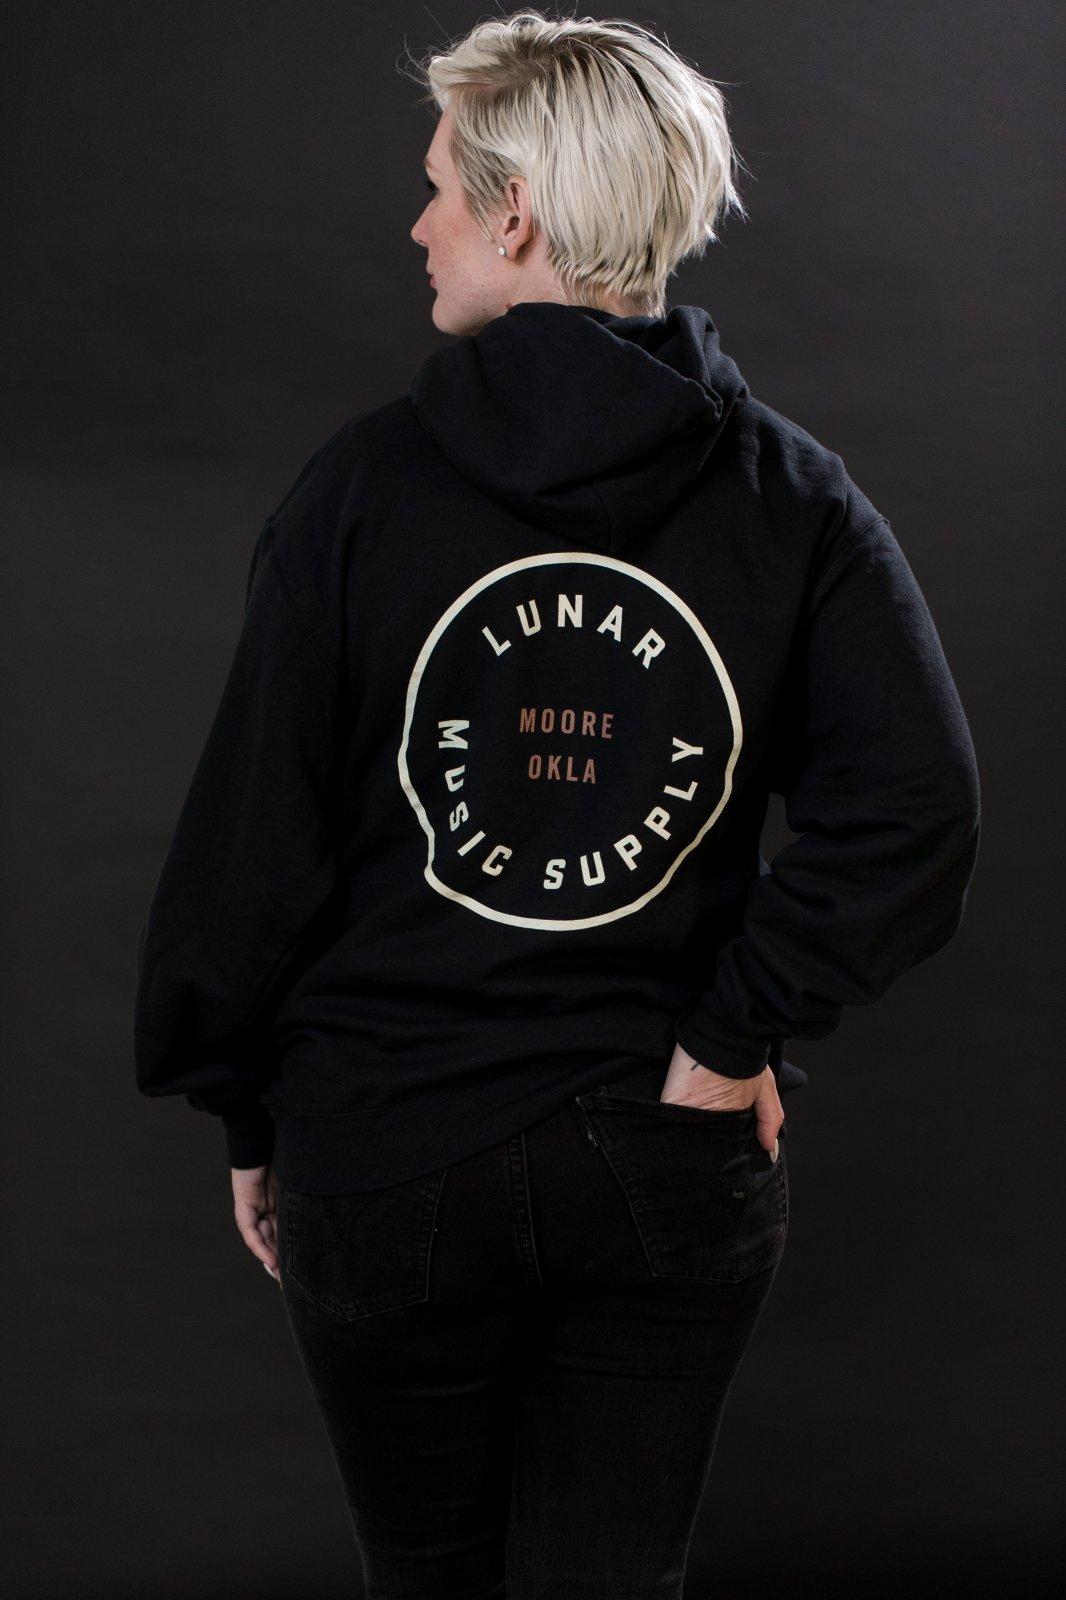 Lunar Music Supply - Winter 19' Hoodie